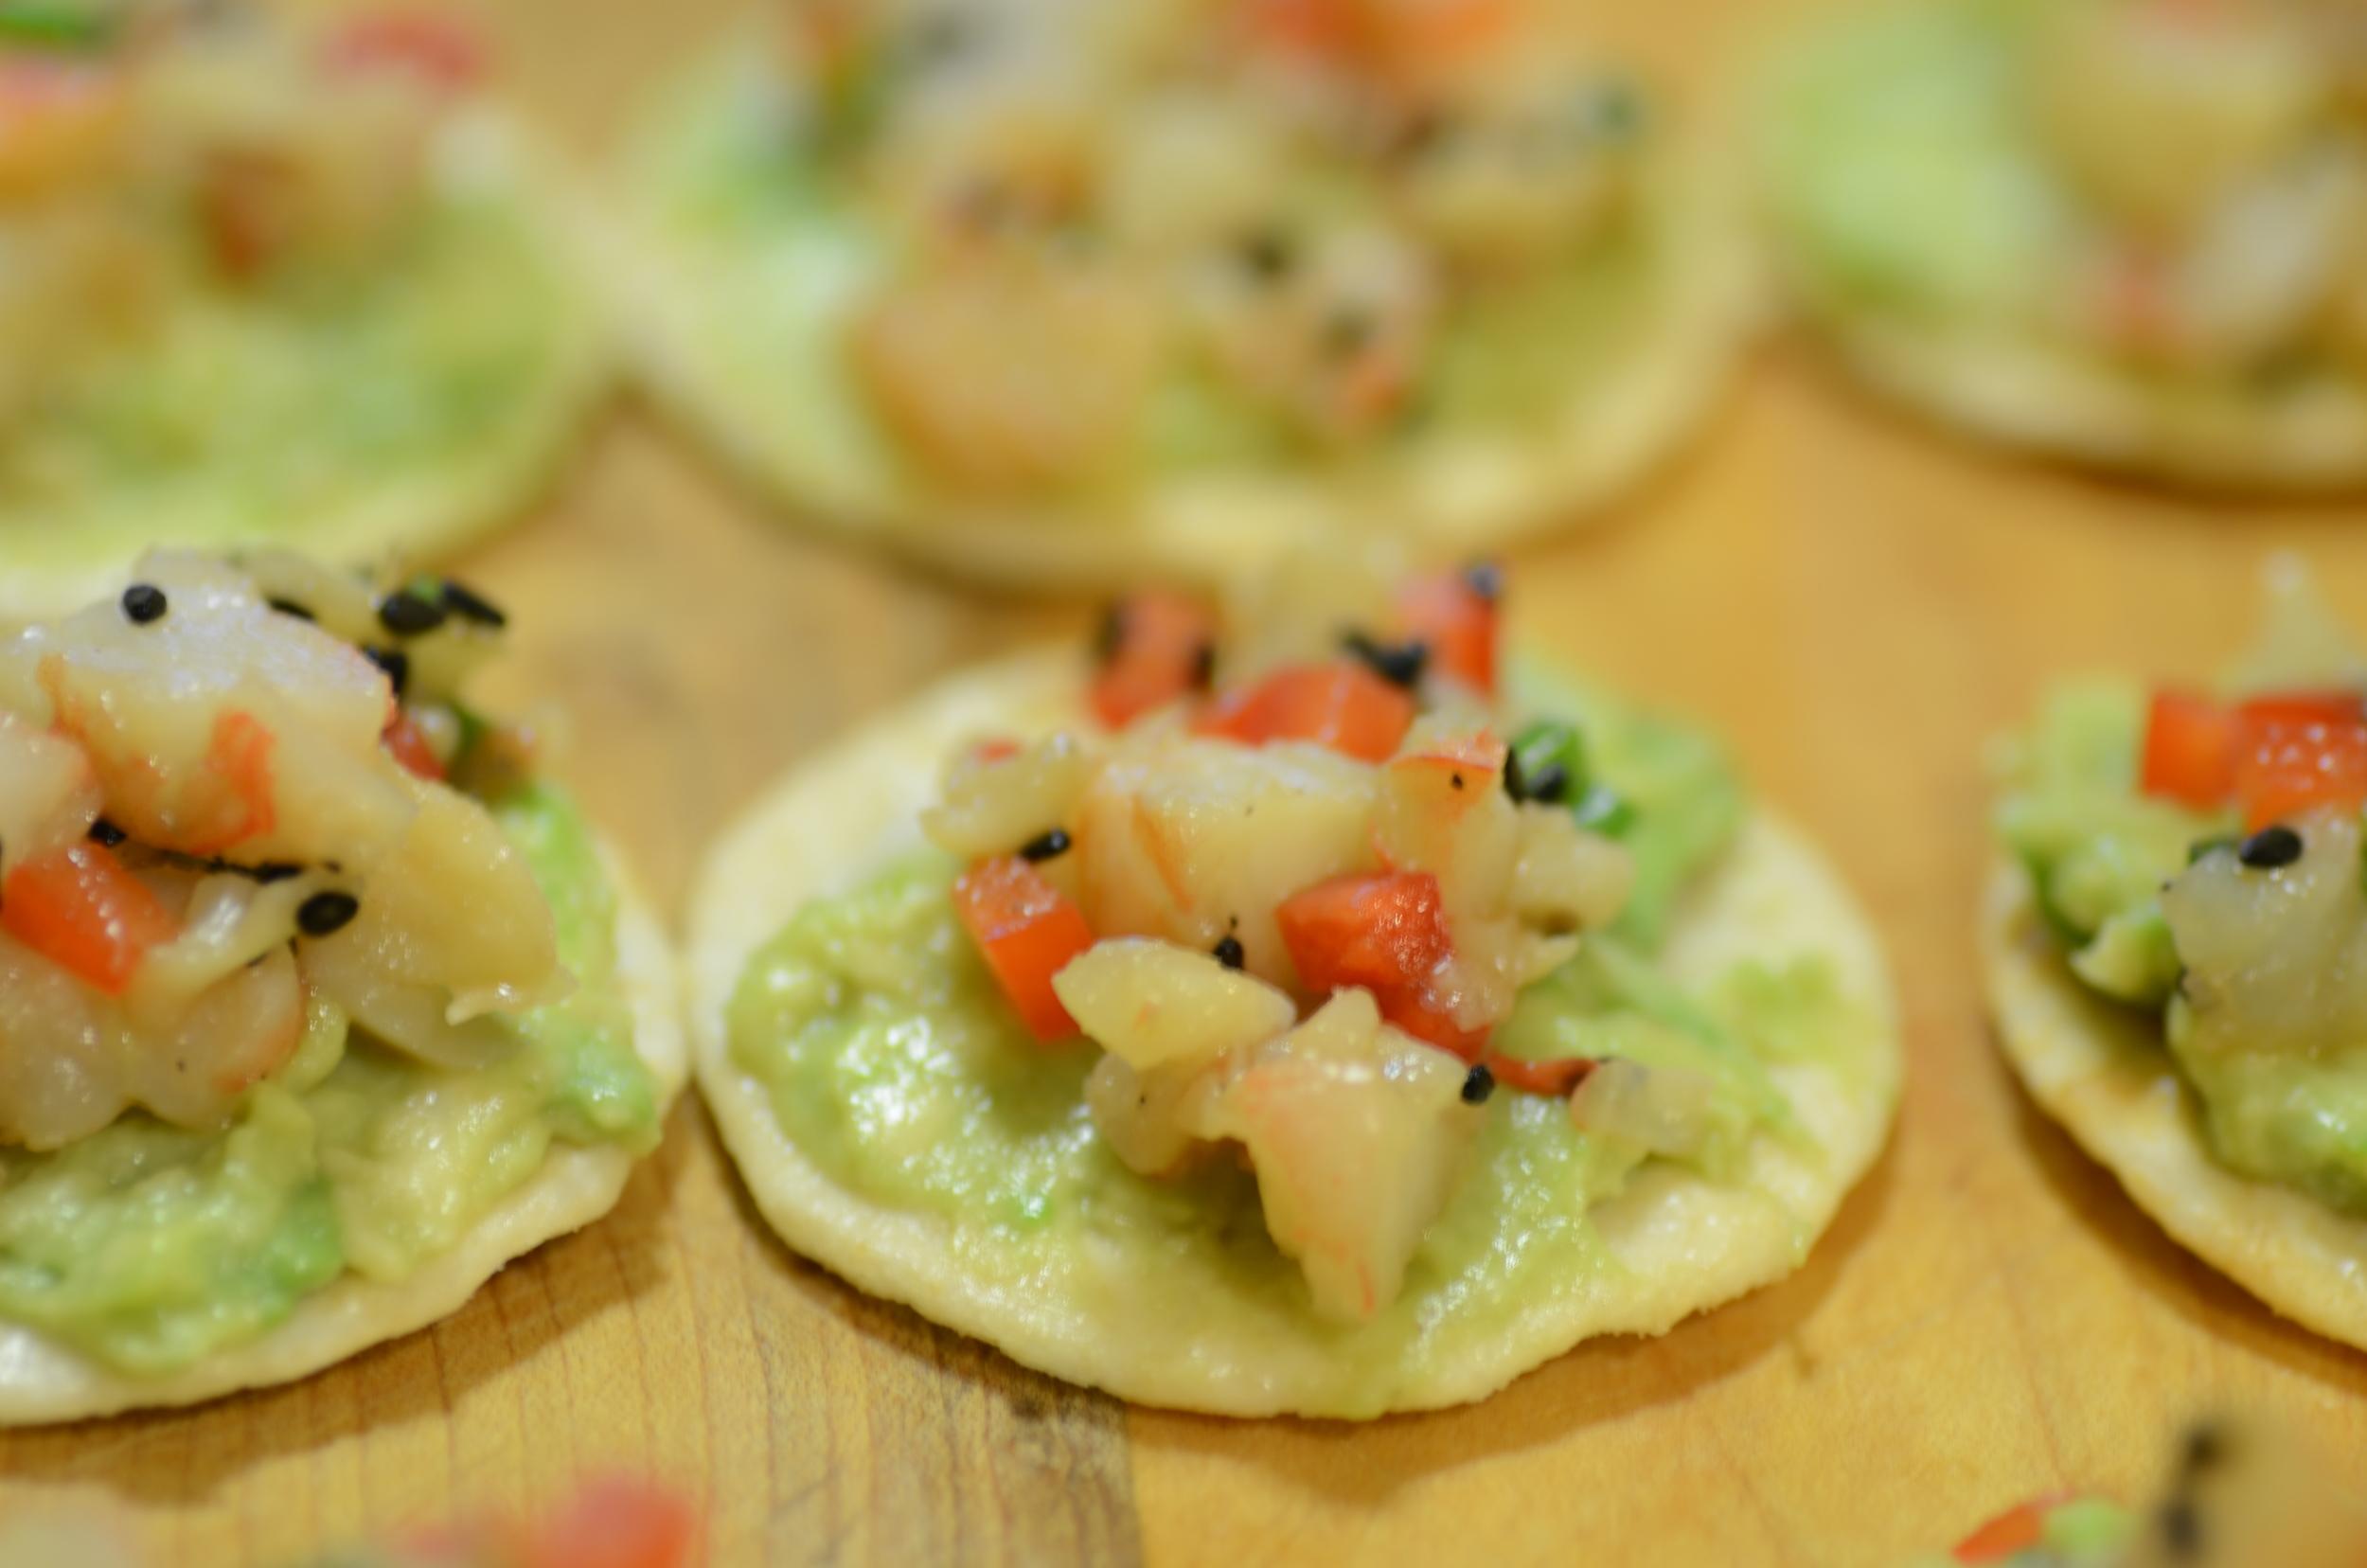 Crab Salad, Avocado on a Rice Cracker